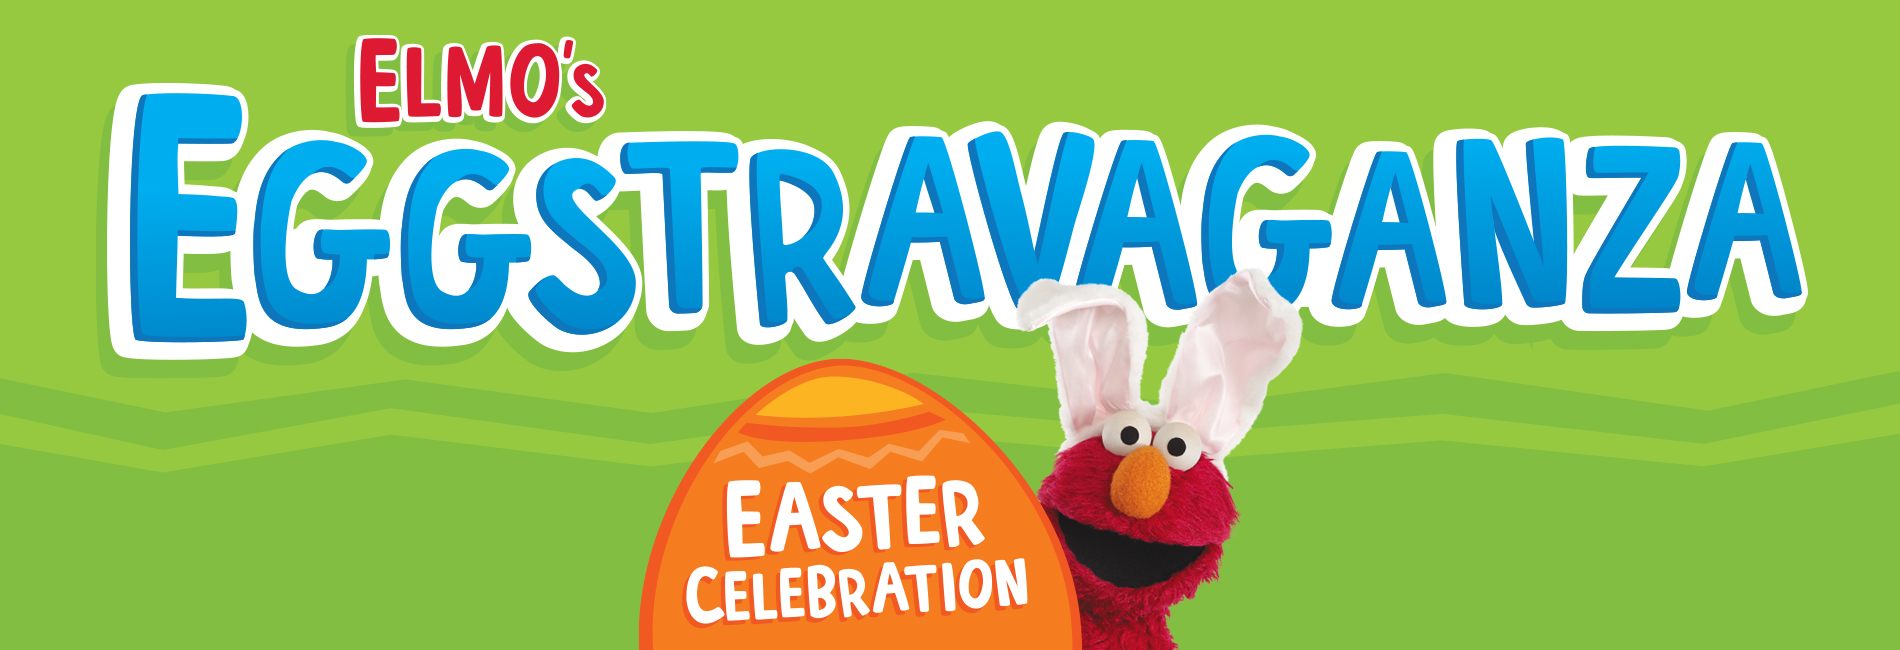 Elmo's Eggstravaganza